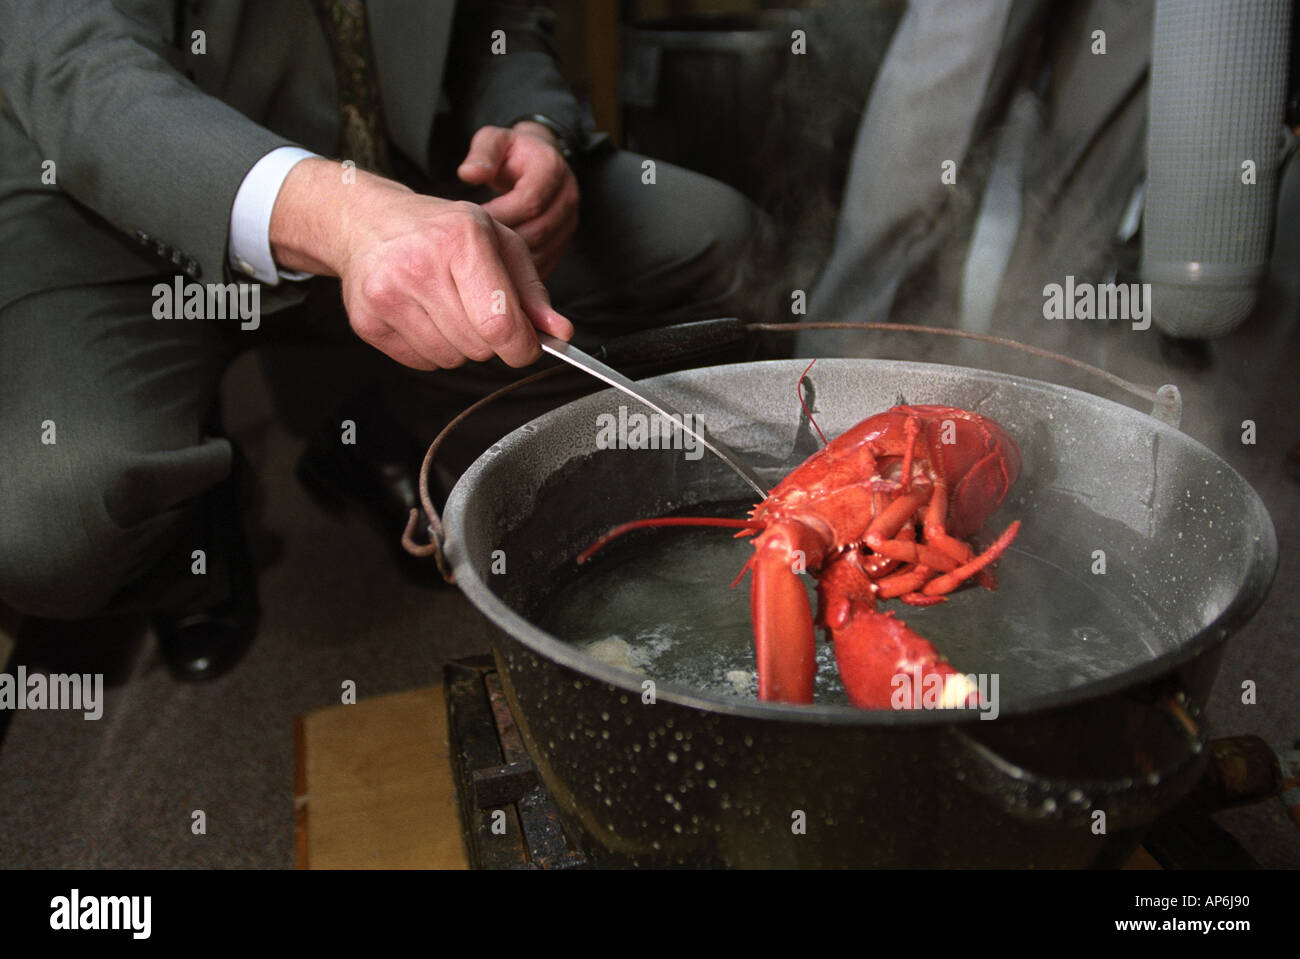 J C Lobster Pot A LOBSTER IN A POT OF ...